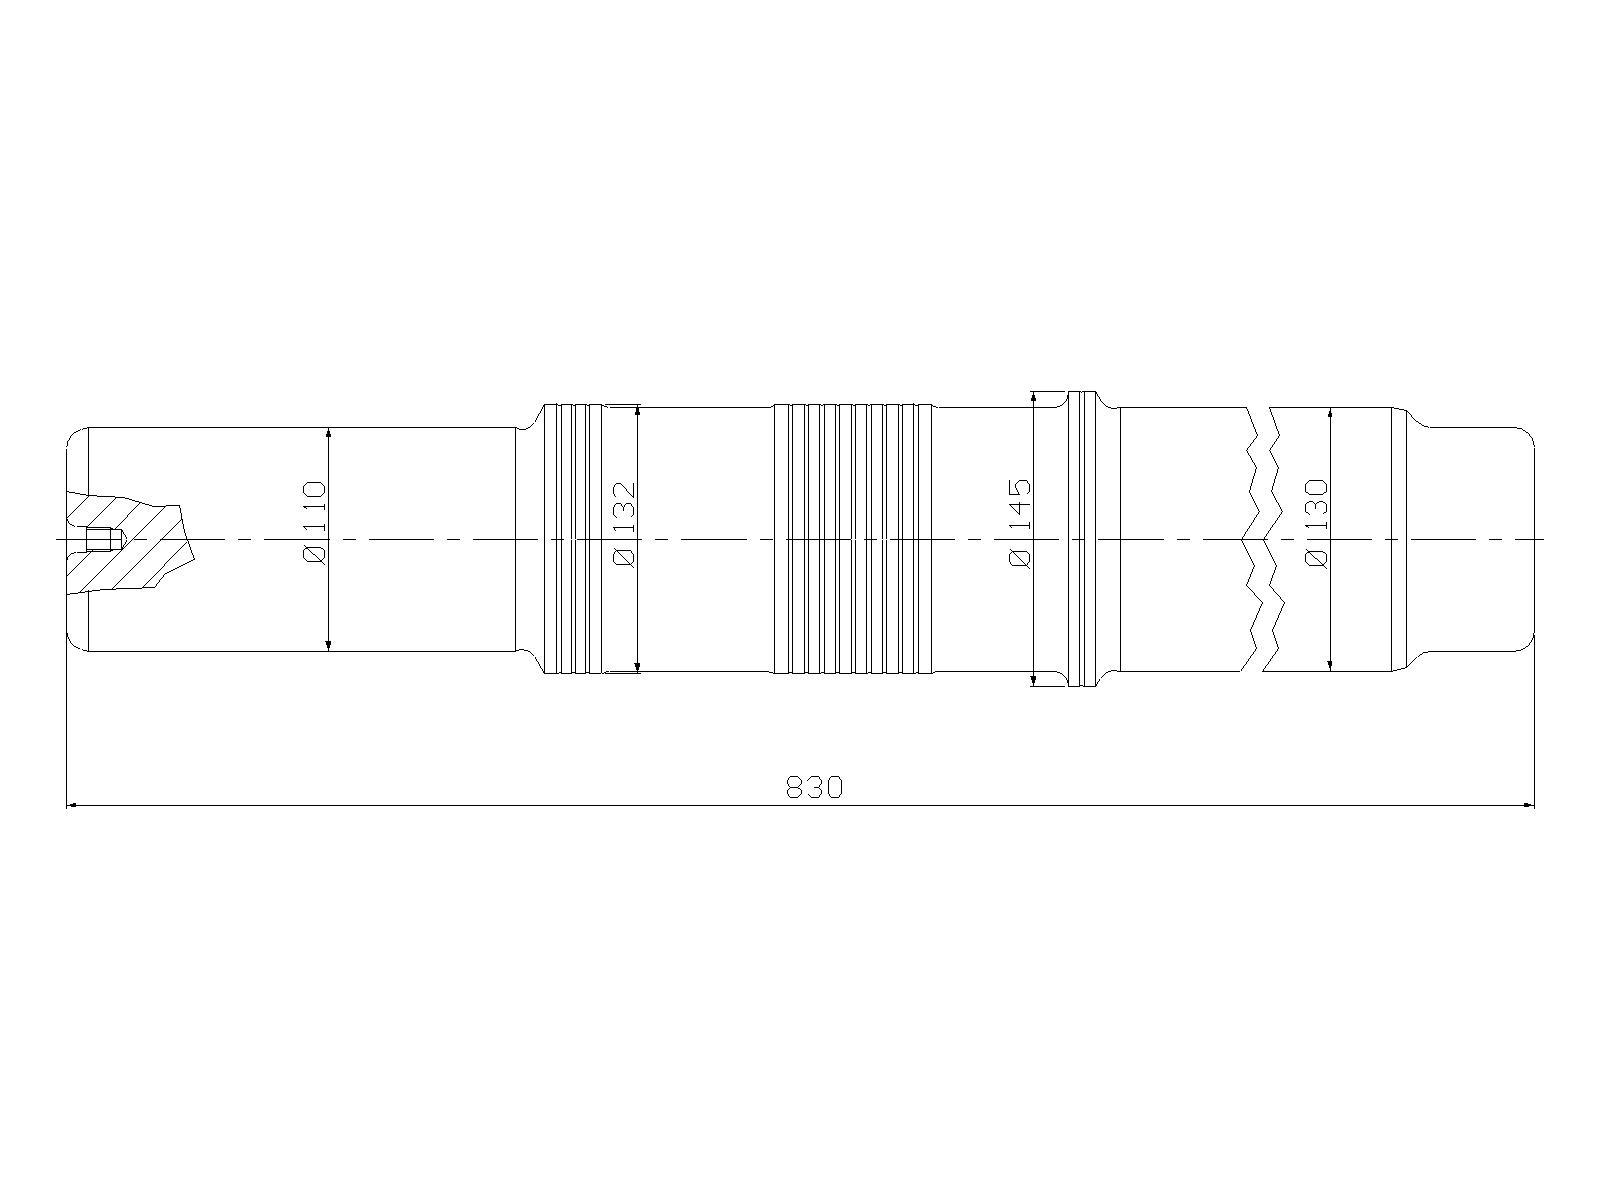 Piston, ATLAS COPCO, HBC 4000 II, hydraulic hammer, spare